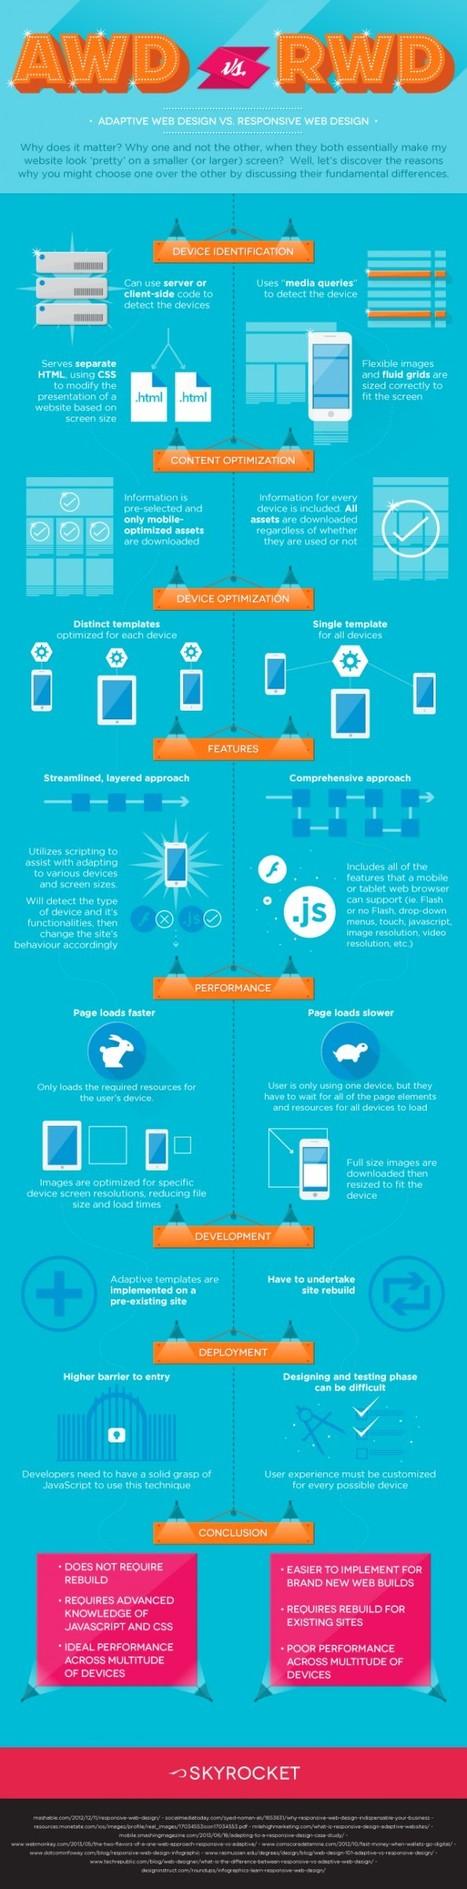 Adaptive Web Design vs. Responsive Web Design | Skyrkt | #TheMarketingAutomationAlert | Web mobile - UI Design - Html5-CSS3 | Scoop.it